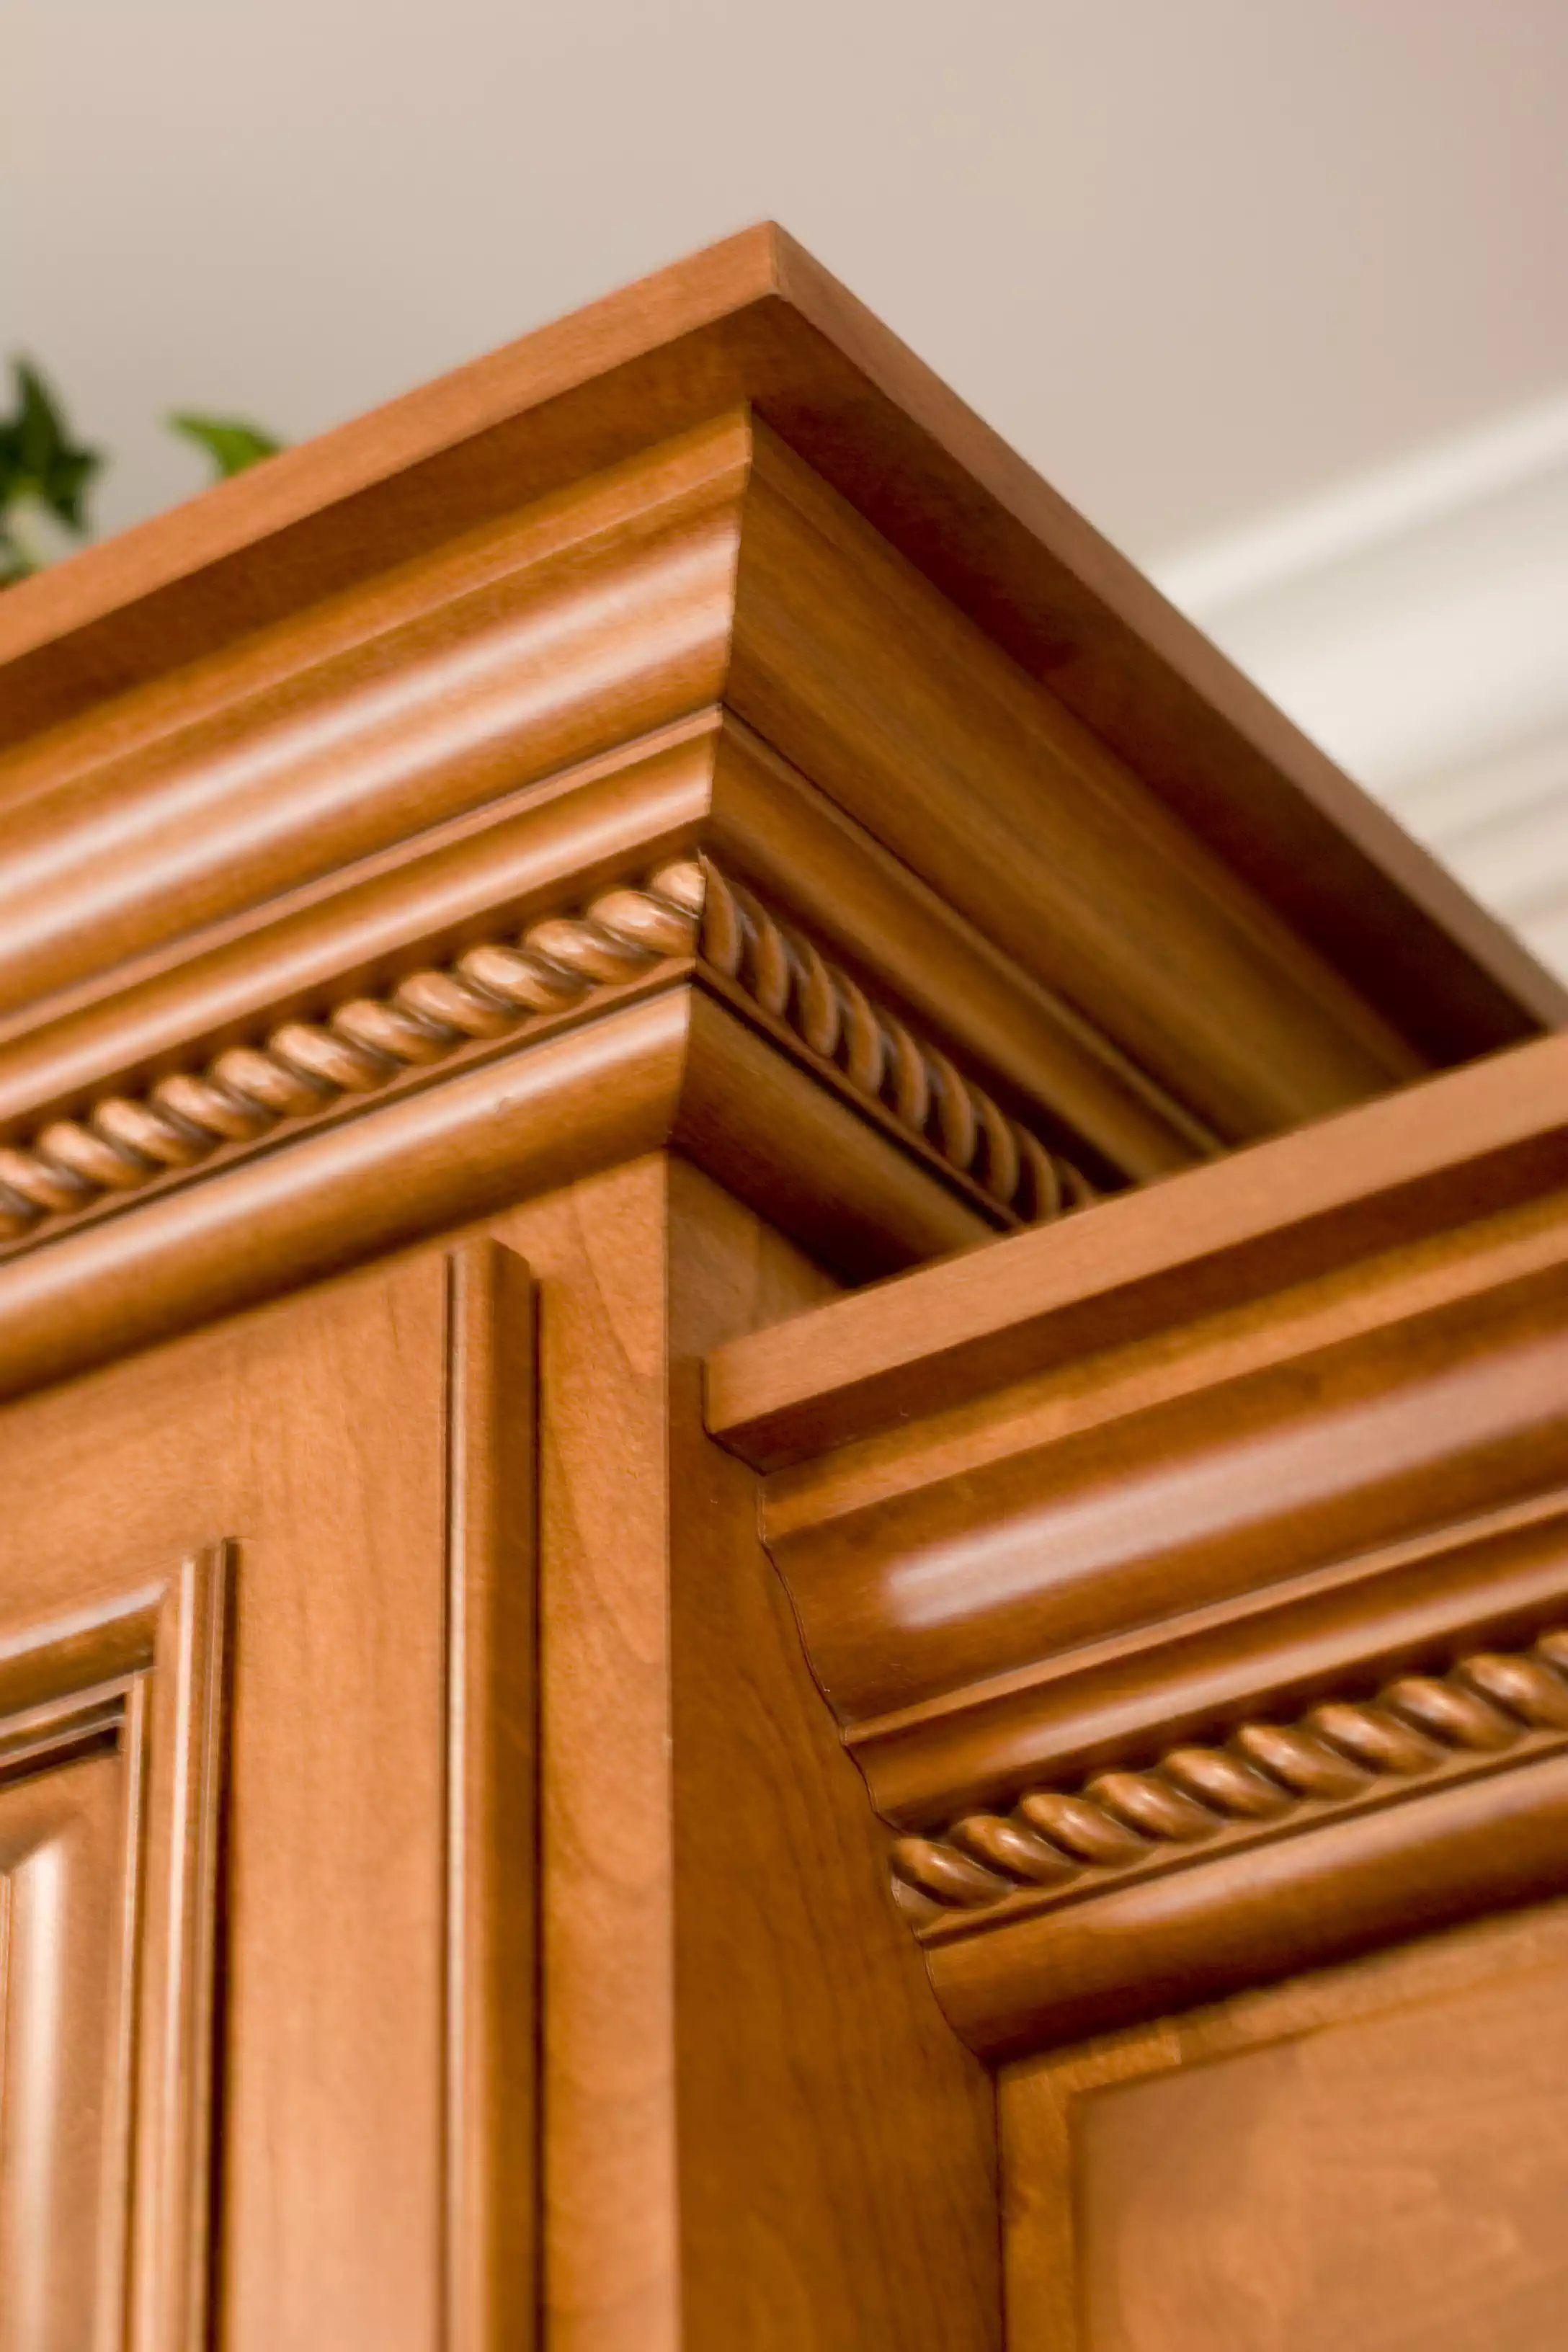 Corner Rope Molding Details Stained Kitchen Cabinetry Kitchen Cabinet Doors Wooden Door Design Kitchen Cupboards